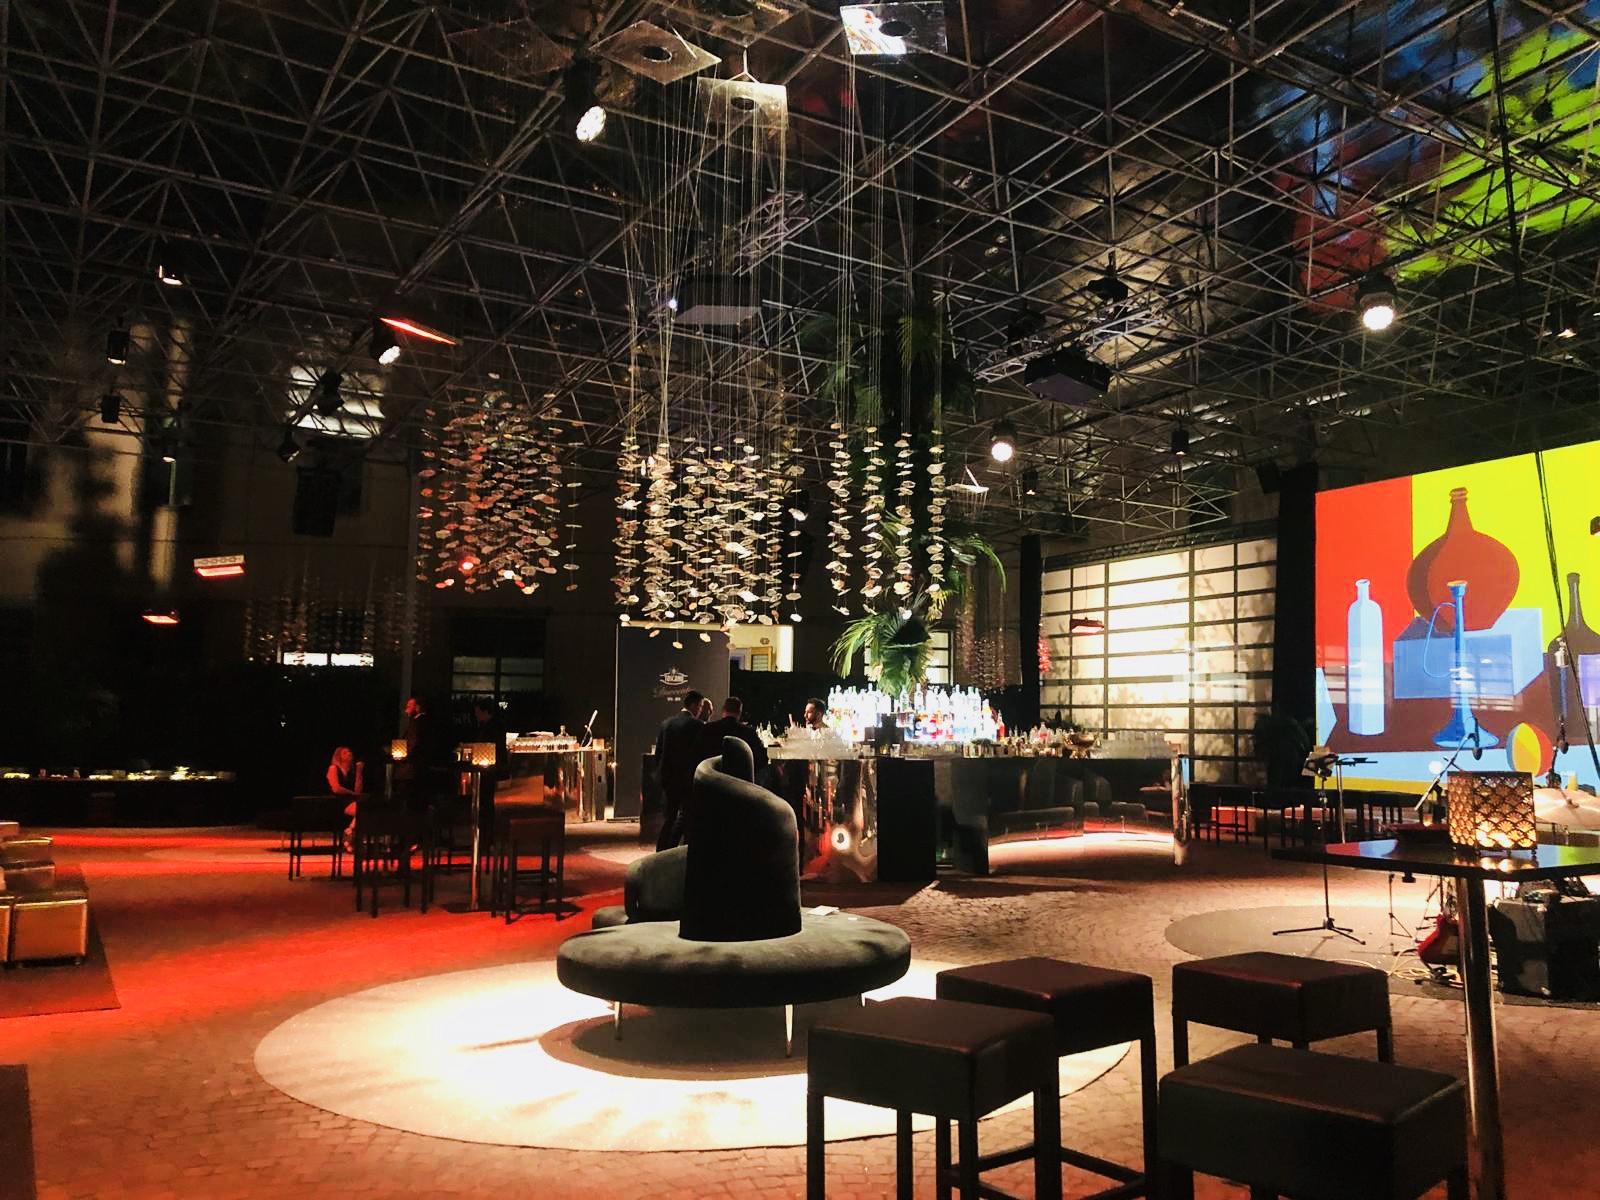 200 anni di Manifatture Sigaro Toscano 2018 – Firenze – Gala Dinner (Chef Davide Oldani), Pièce teatrale (Lella Costa), Djset e Live Performance.